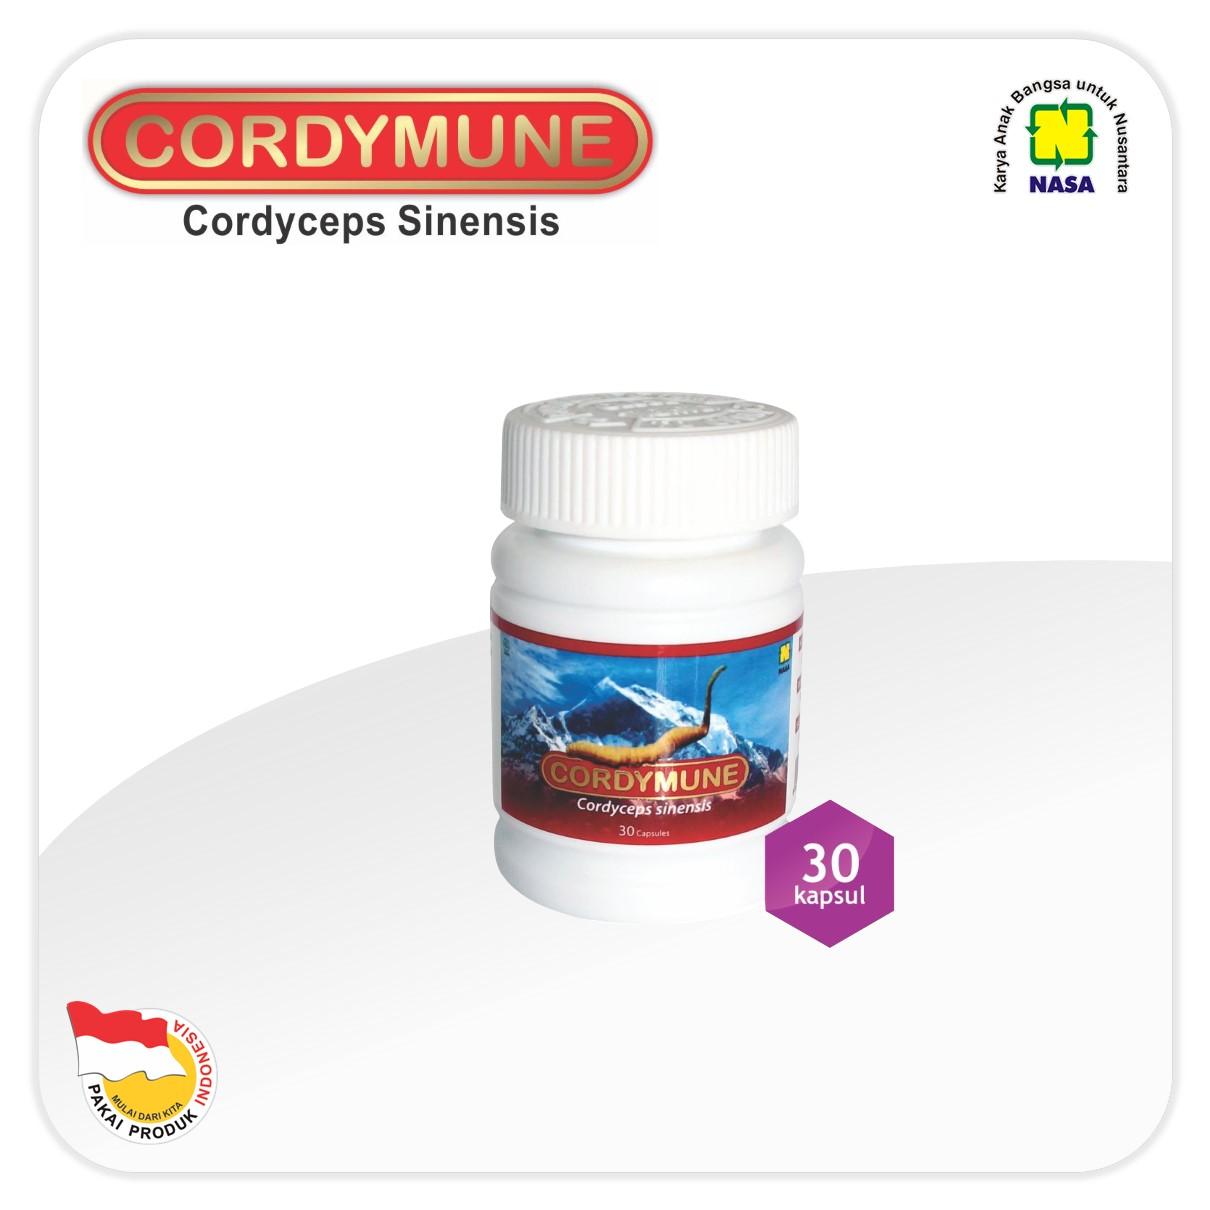 Cordymune Cordyceps Sinensis